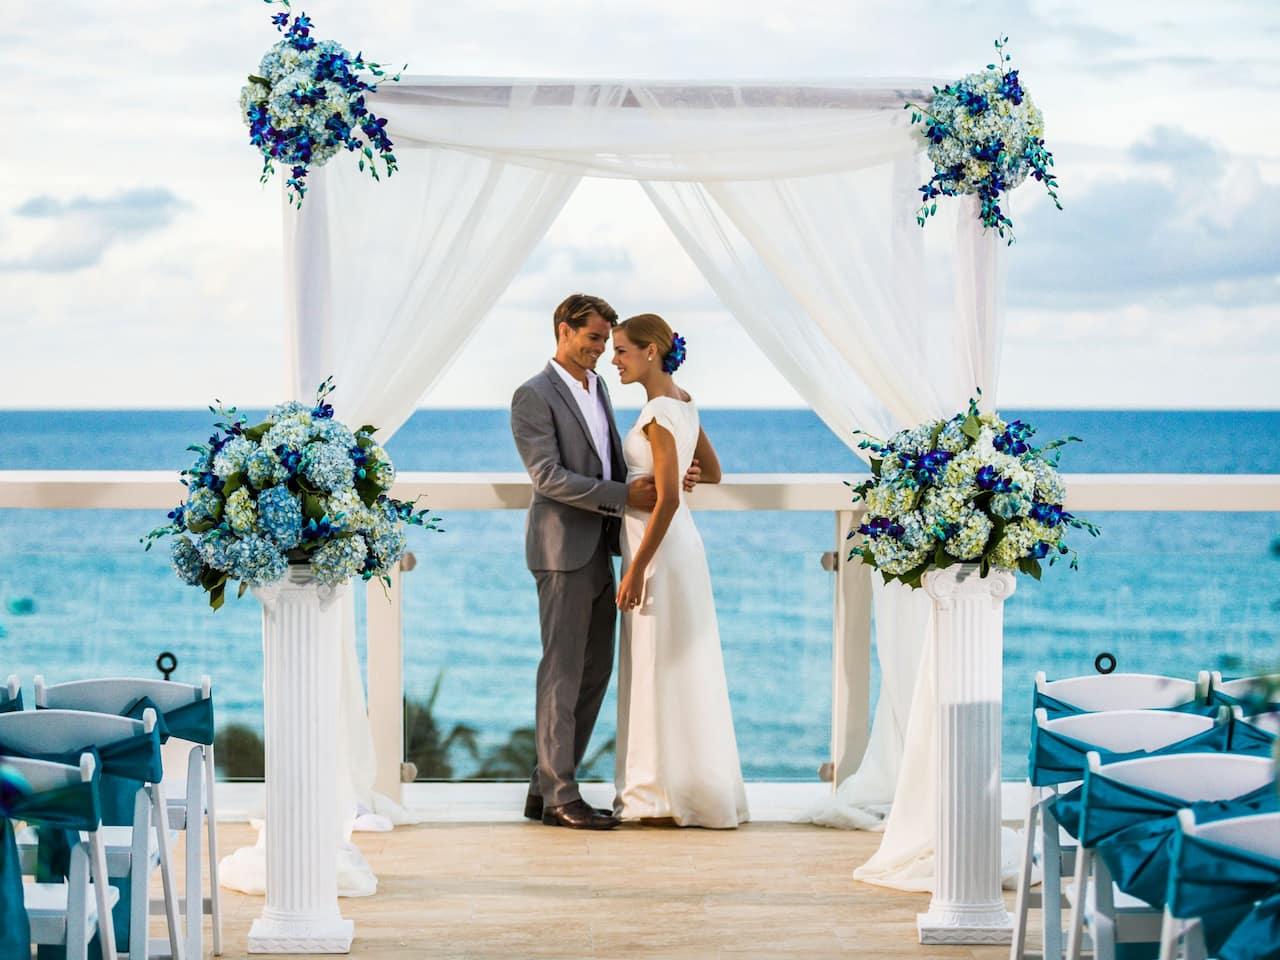 Bride and groom at beach wedding ceremony